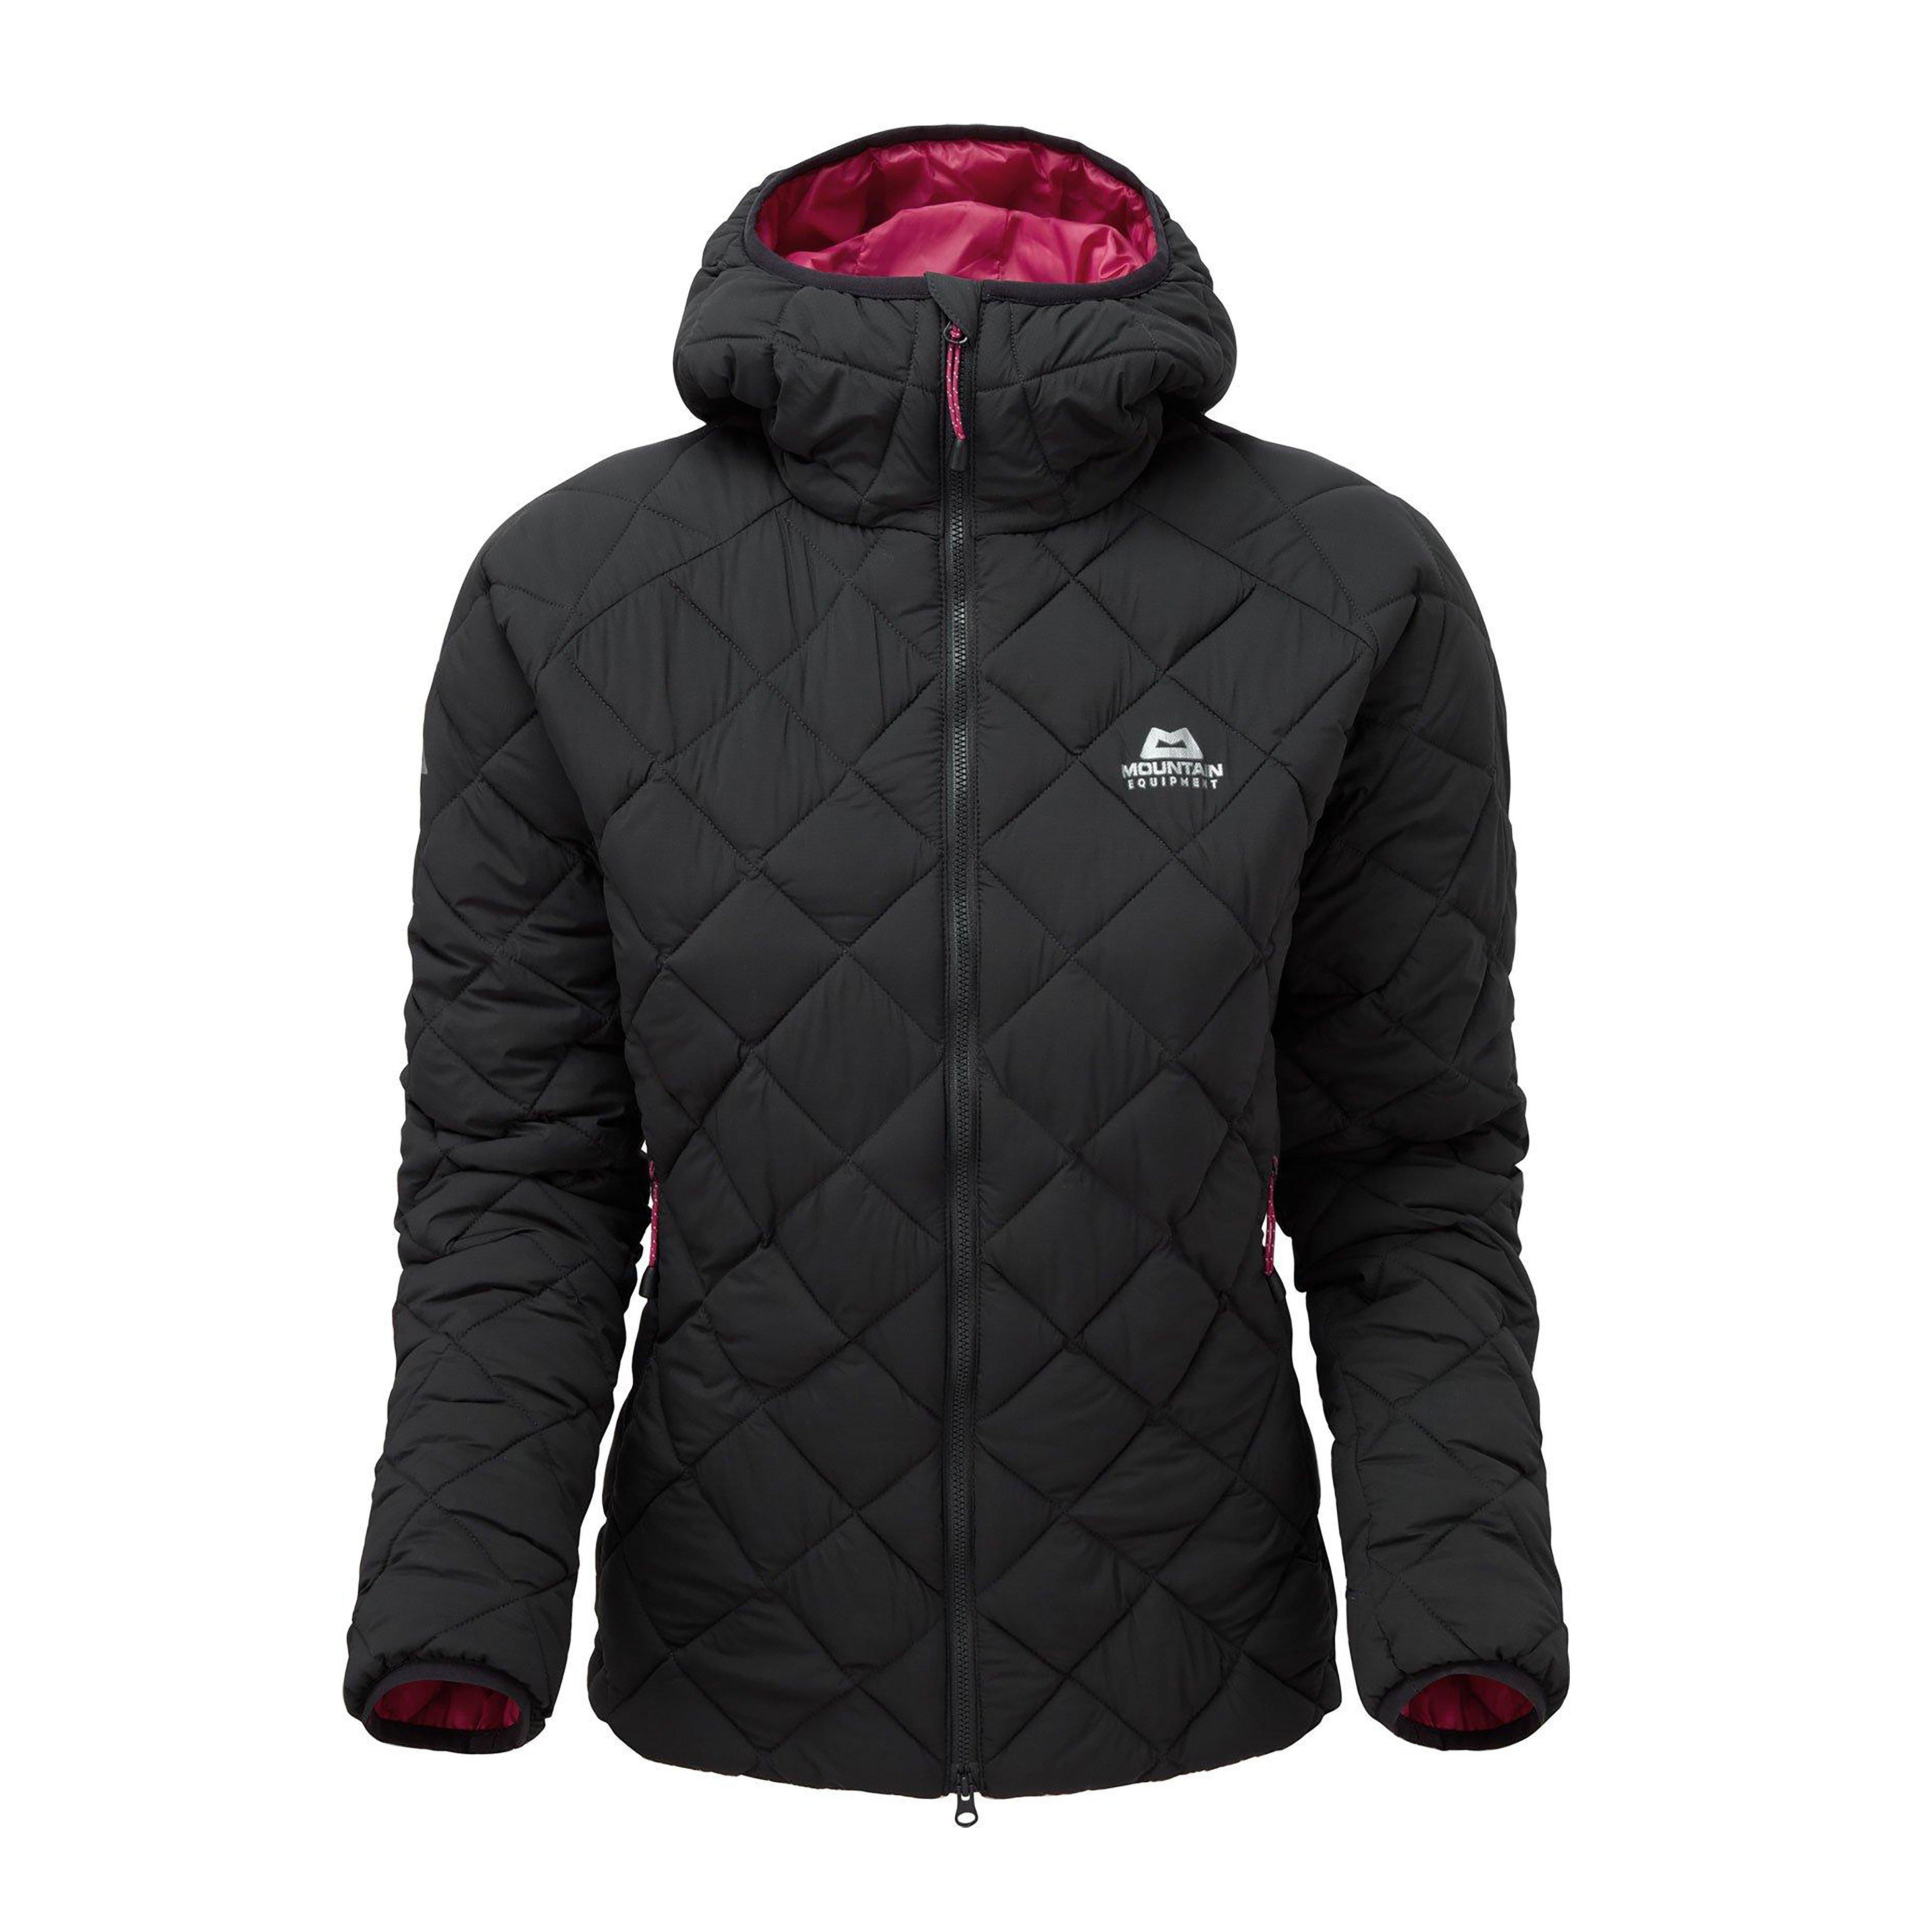 Mountain Equipment Women's Fuse Insulated Jacket, Khaki